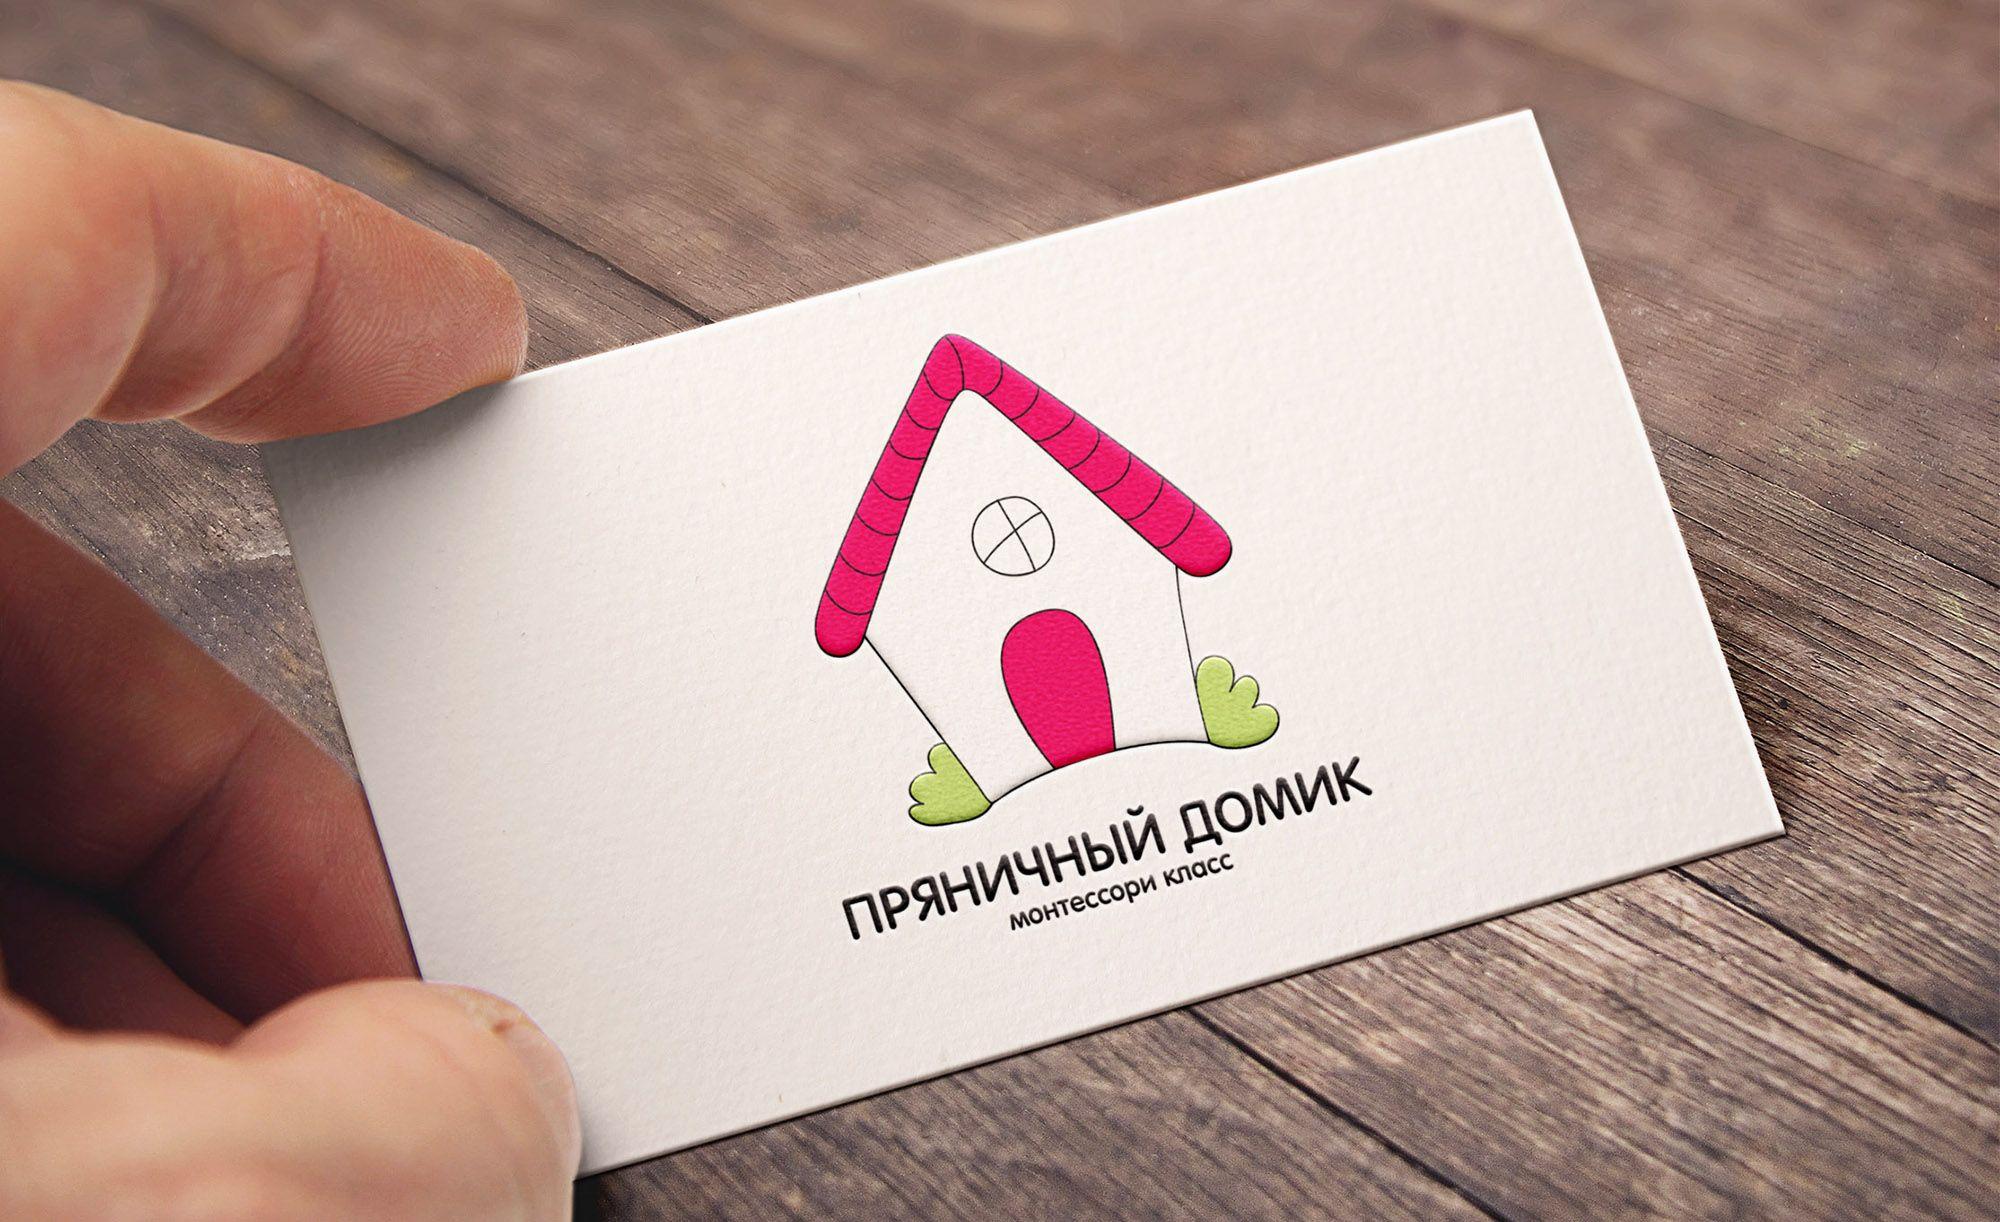 Логотип для ПРЯНИЧНЫЙ ДОМИК монтессори класс - дизайнер Poooosha